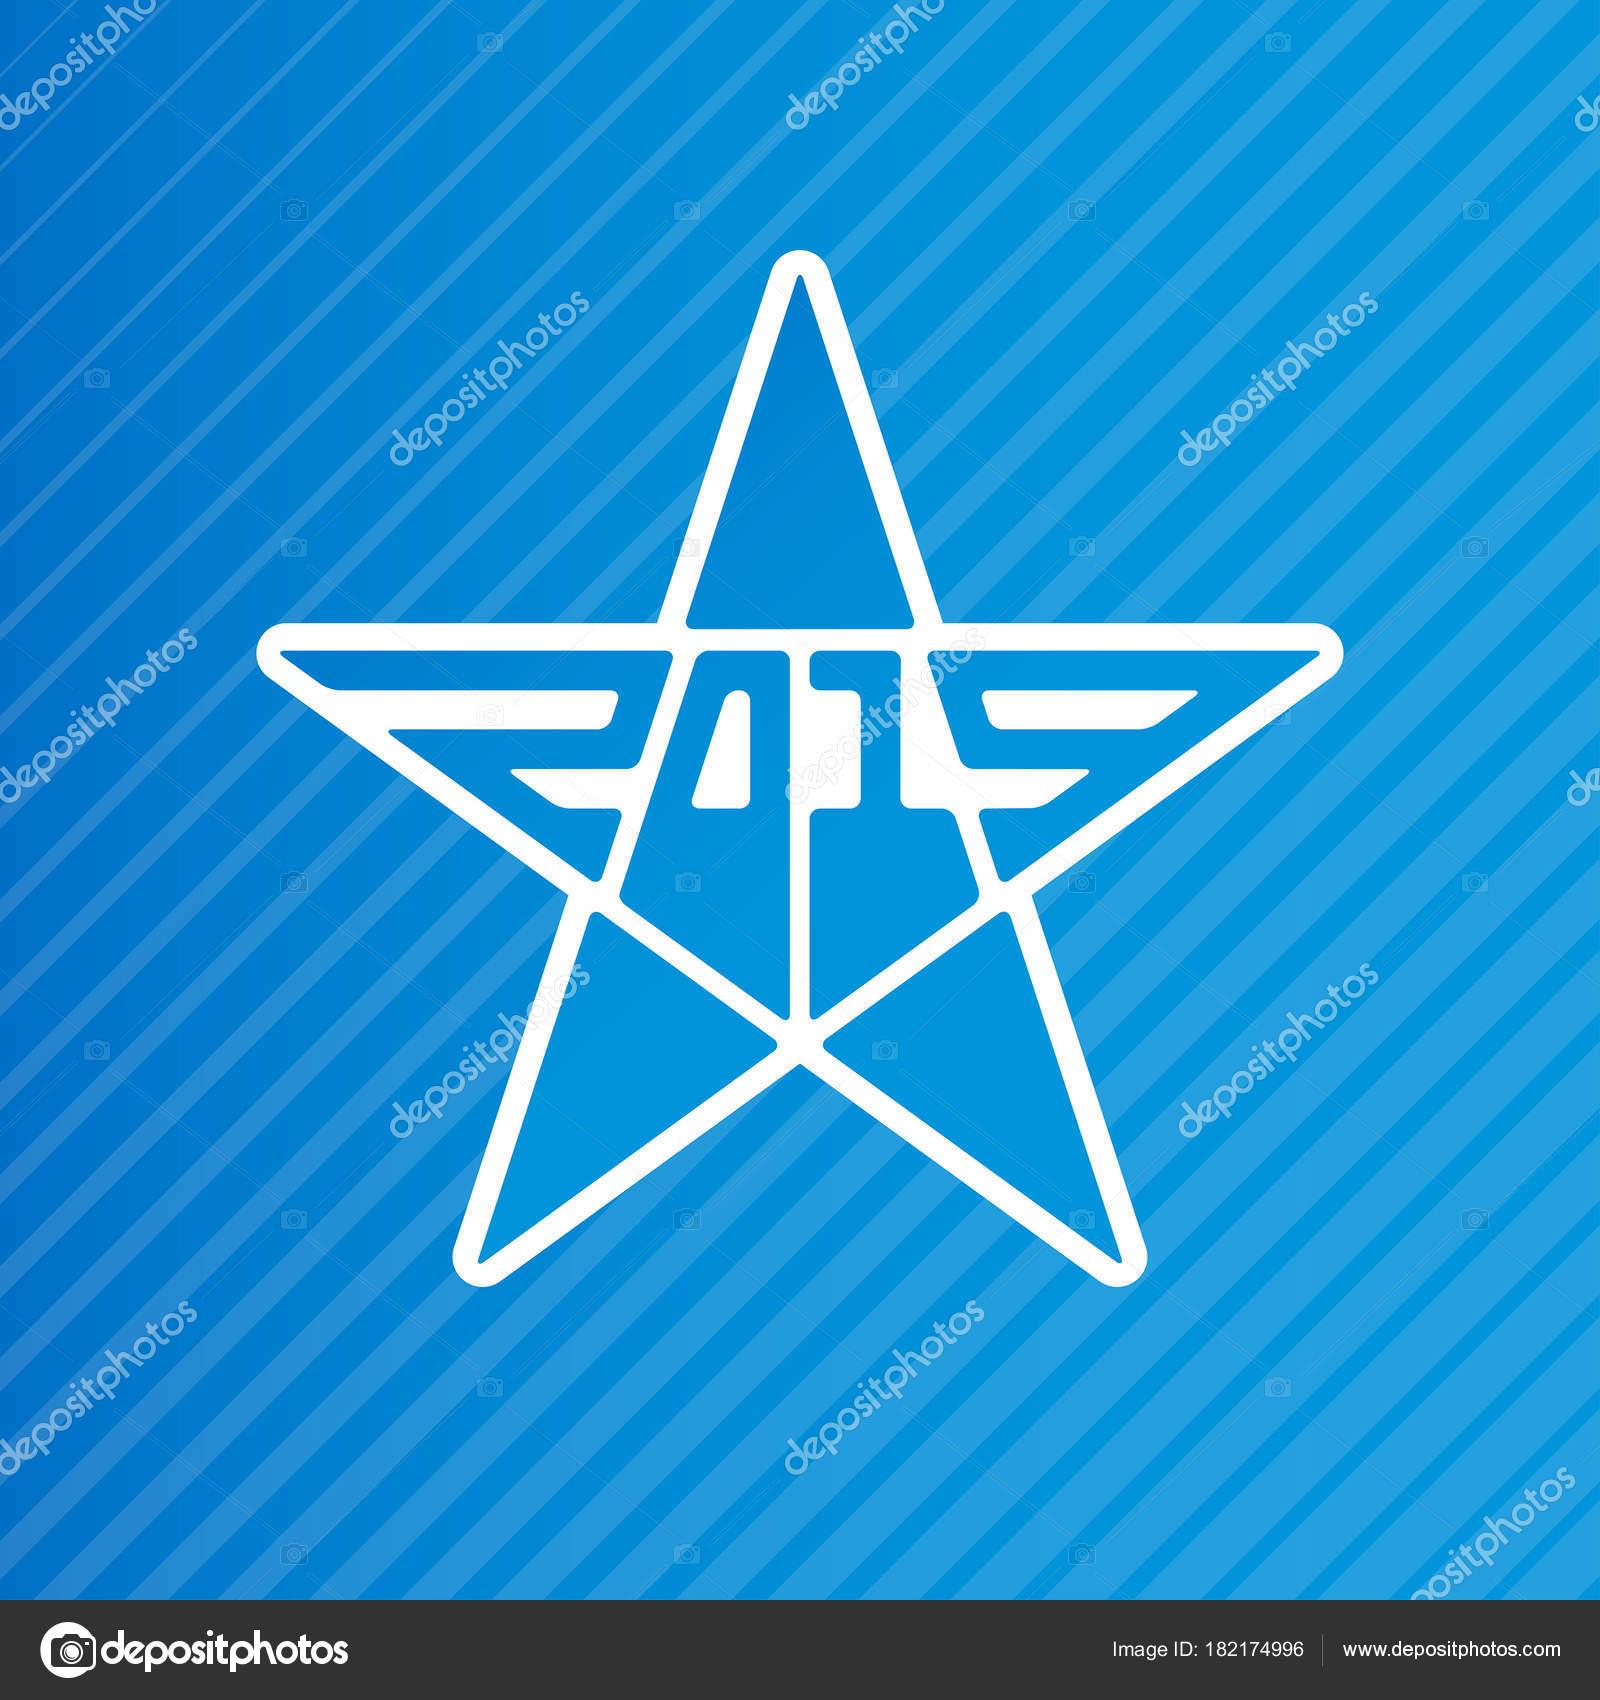 web template invitation new year 2019 star vector illustration logotype stock vector